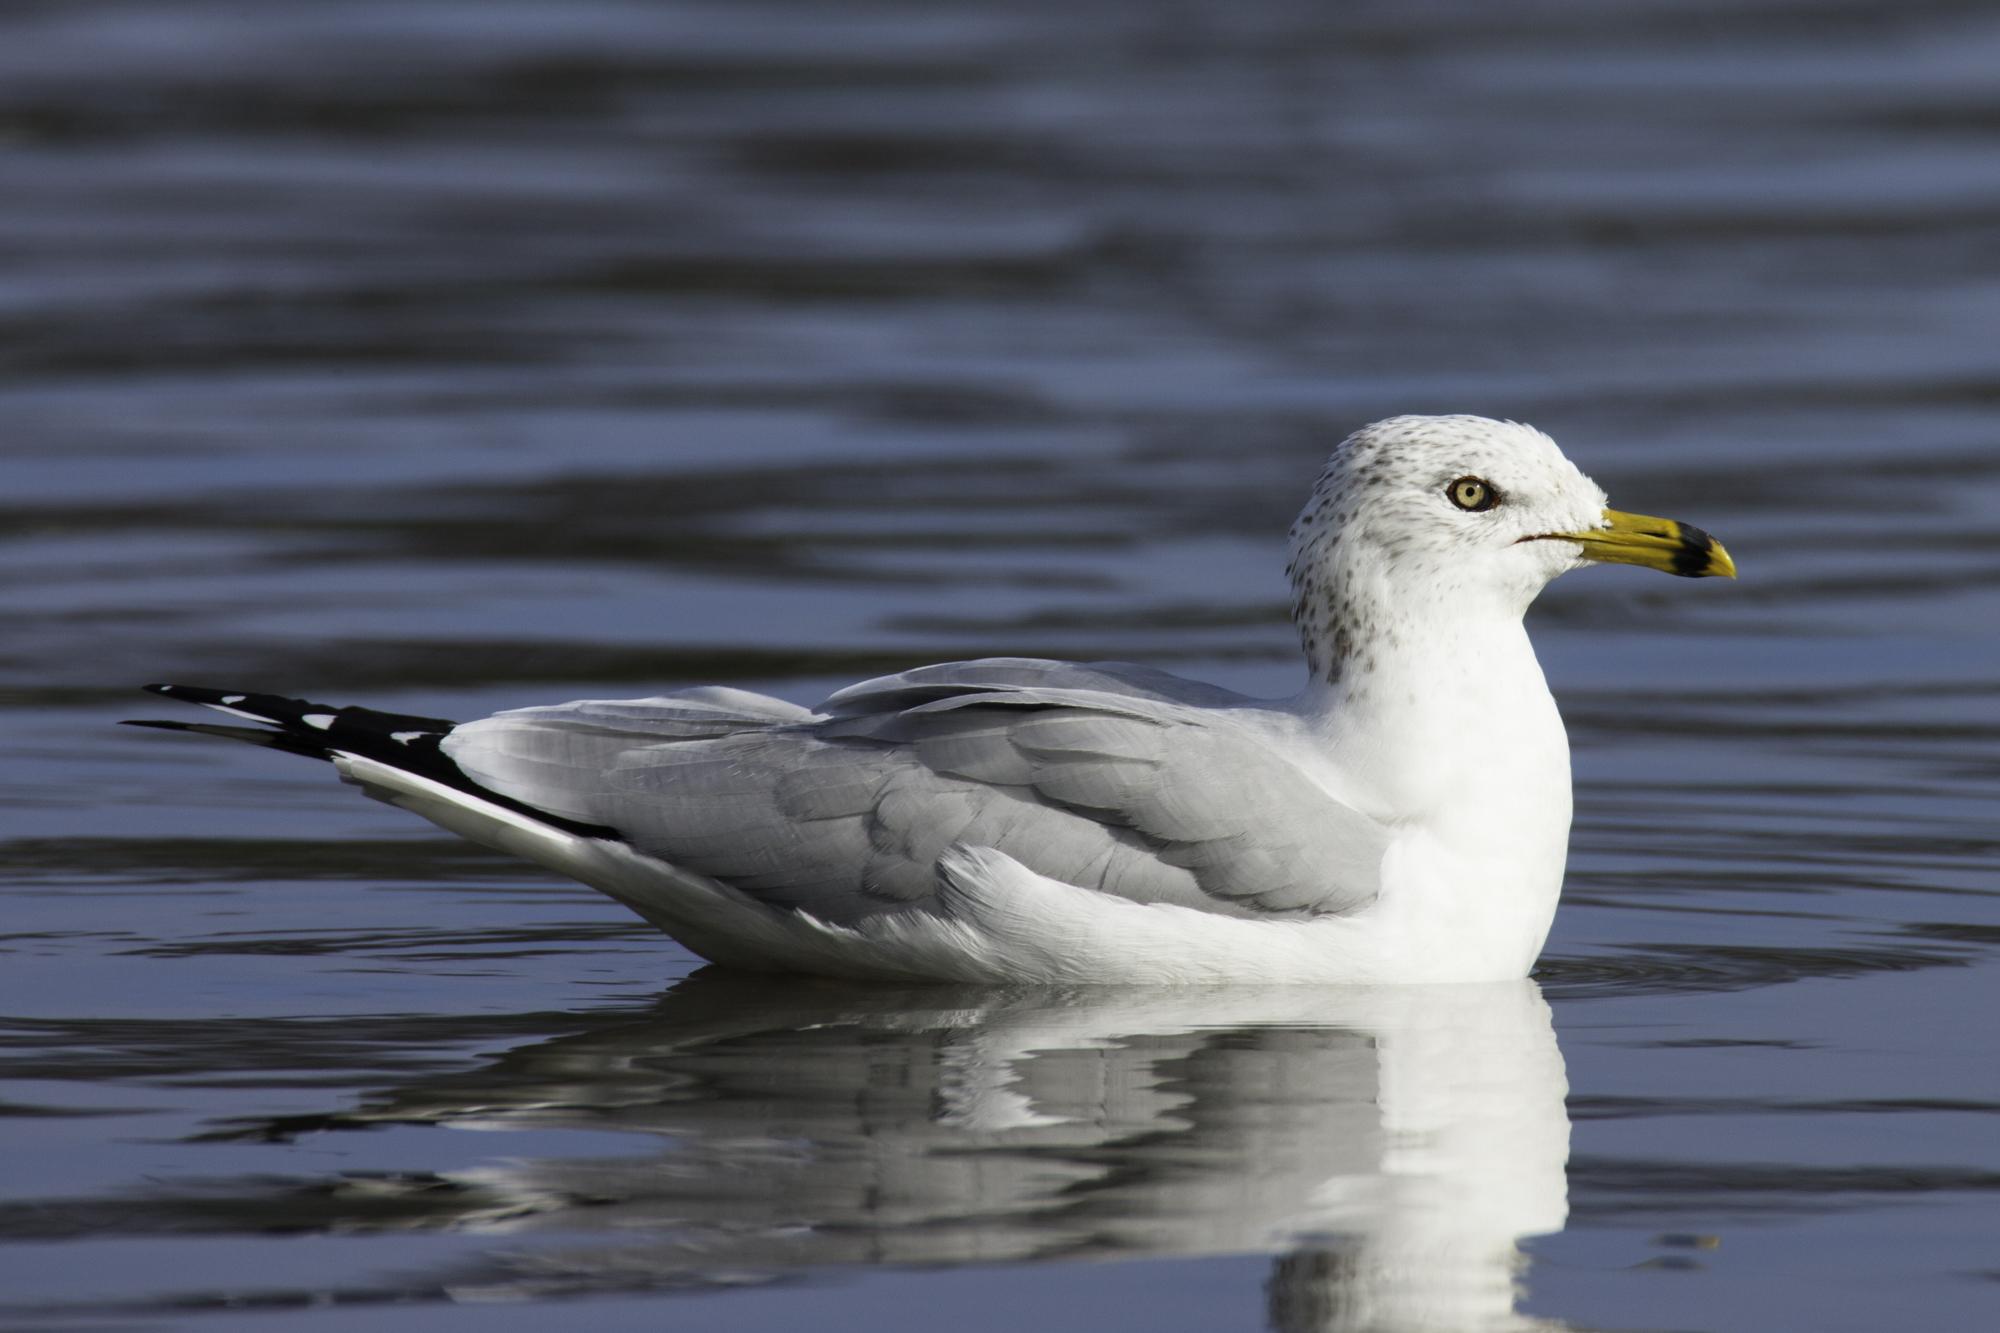 Ring-billed Gull..环嘴鸥